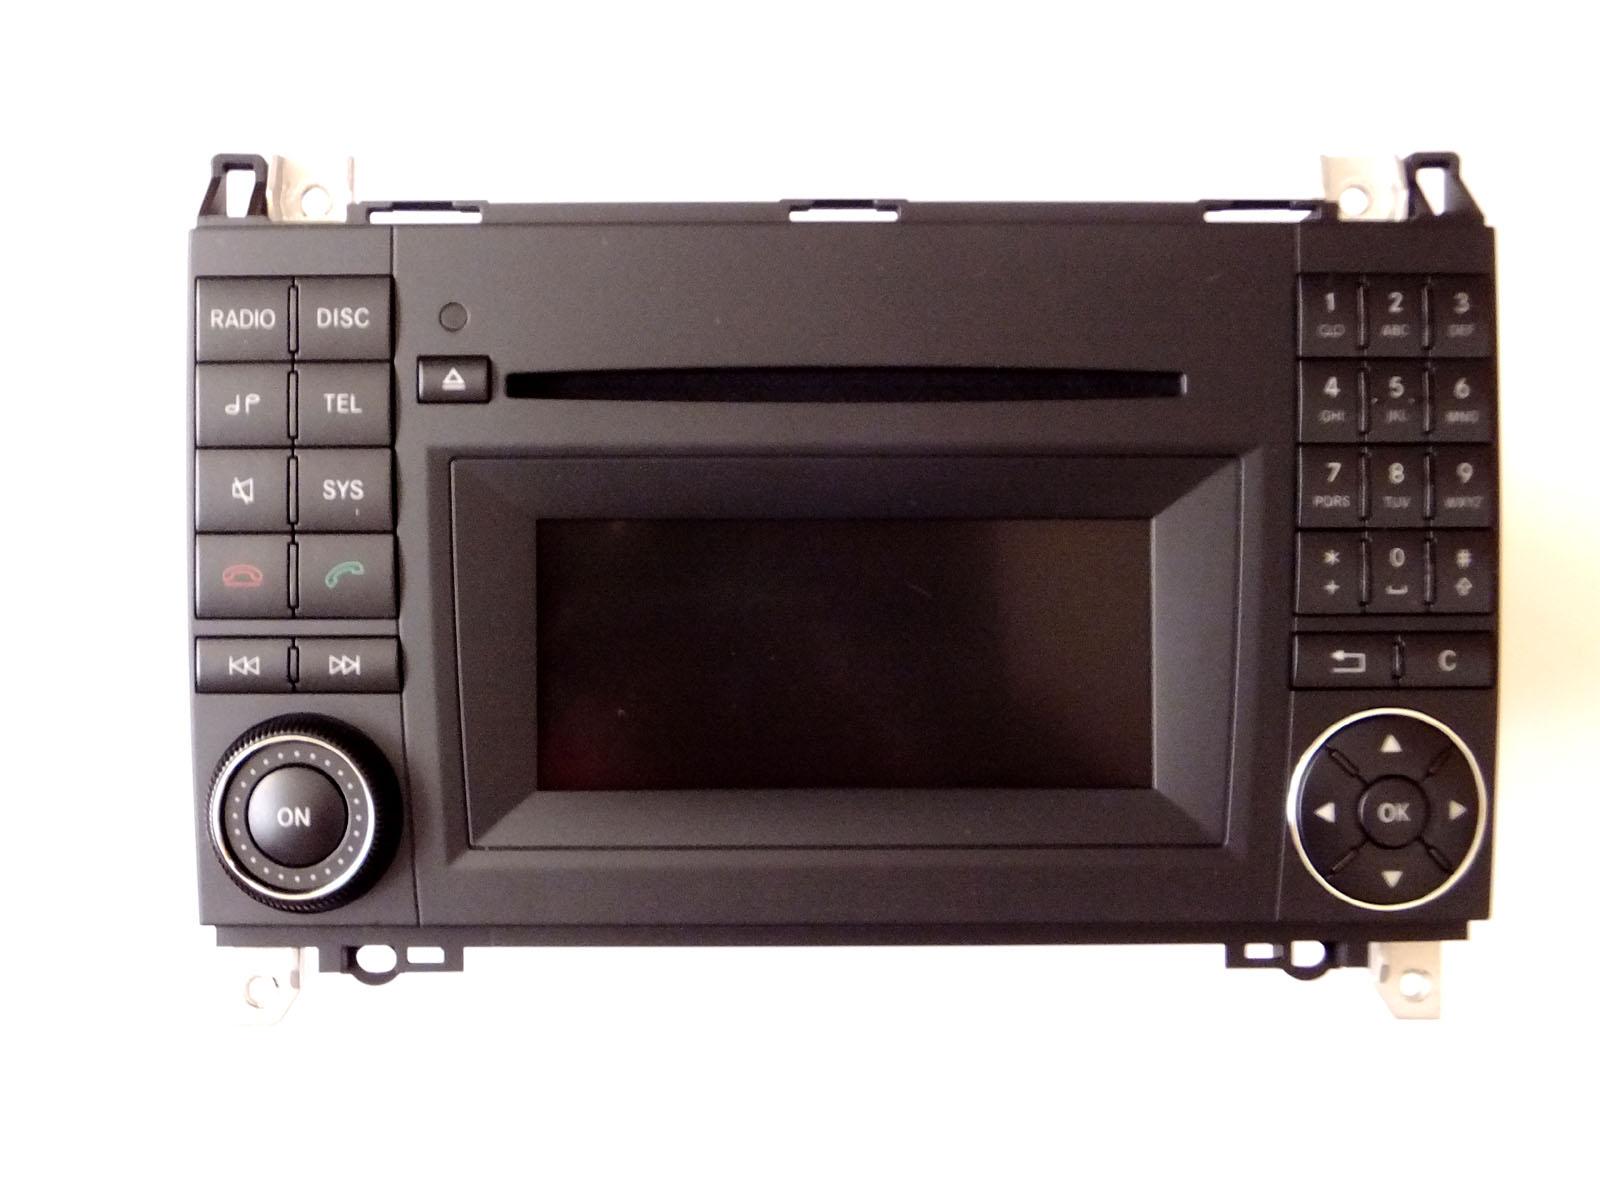 mercedes benz radio audio 20 cd ntg 2 5 a klasse w169 b. Black Bedroom Furniture Sets. Home Design Ideas